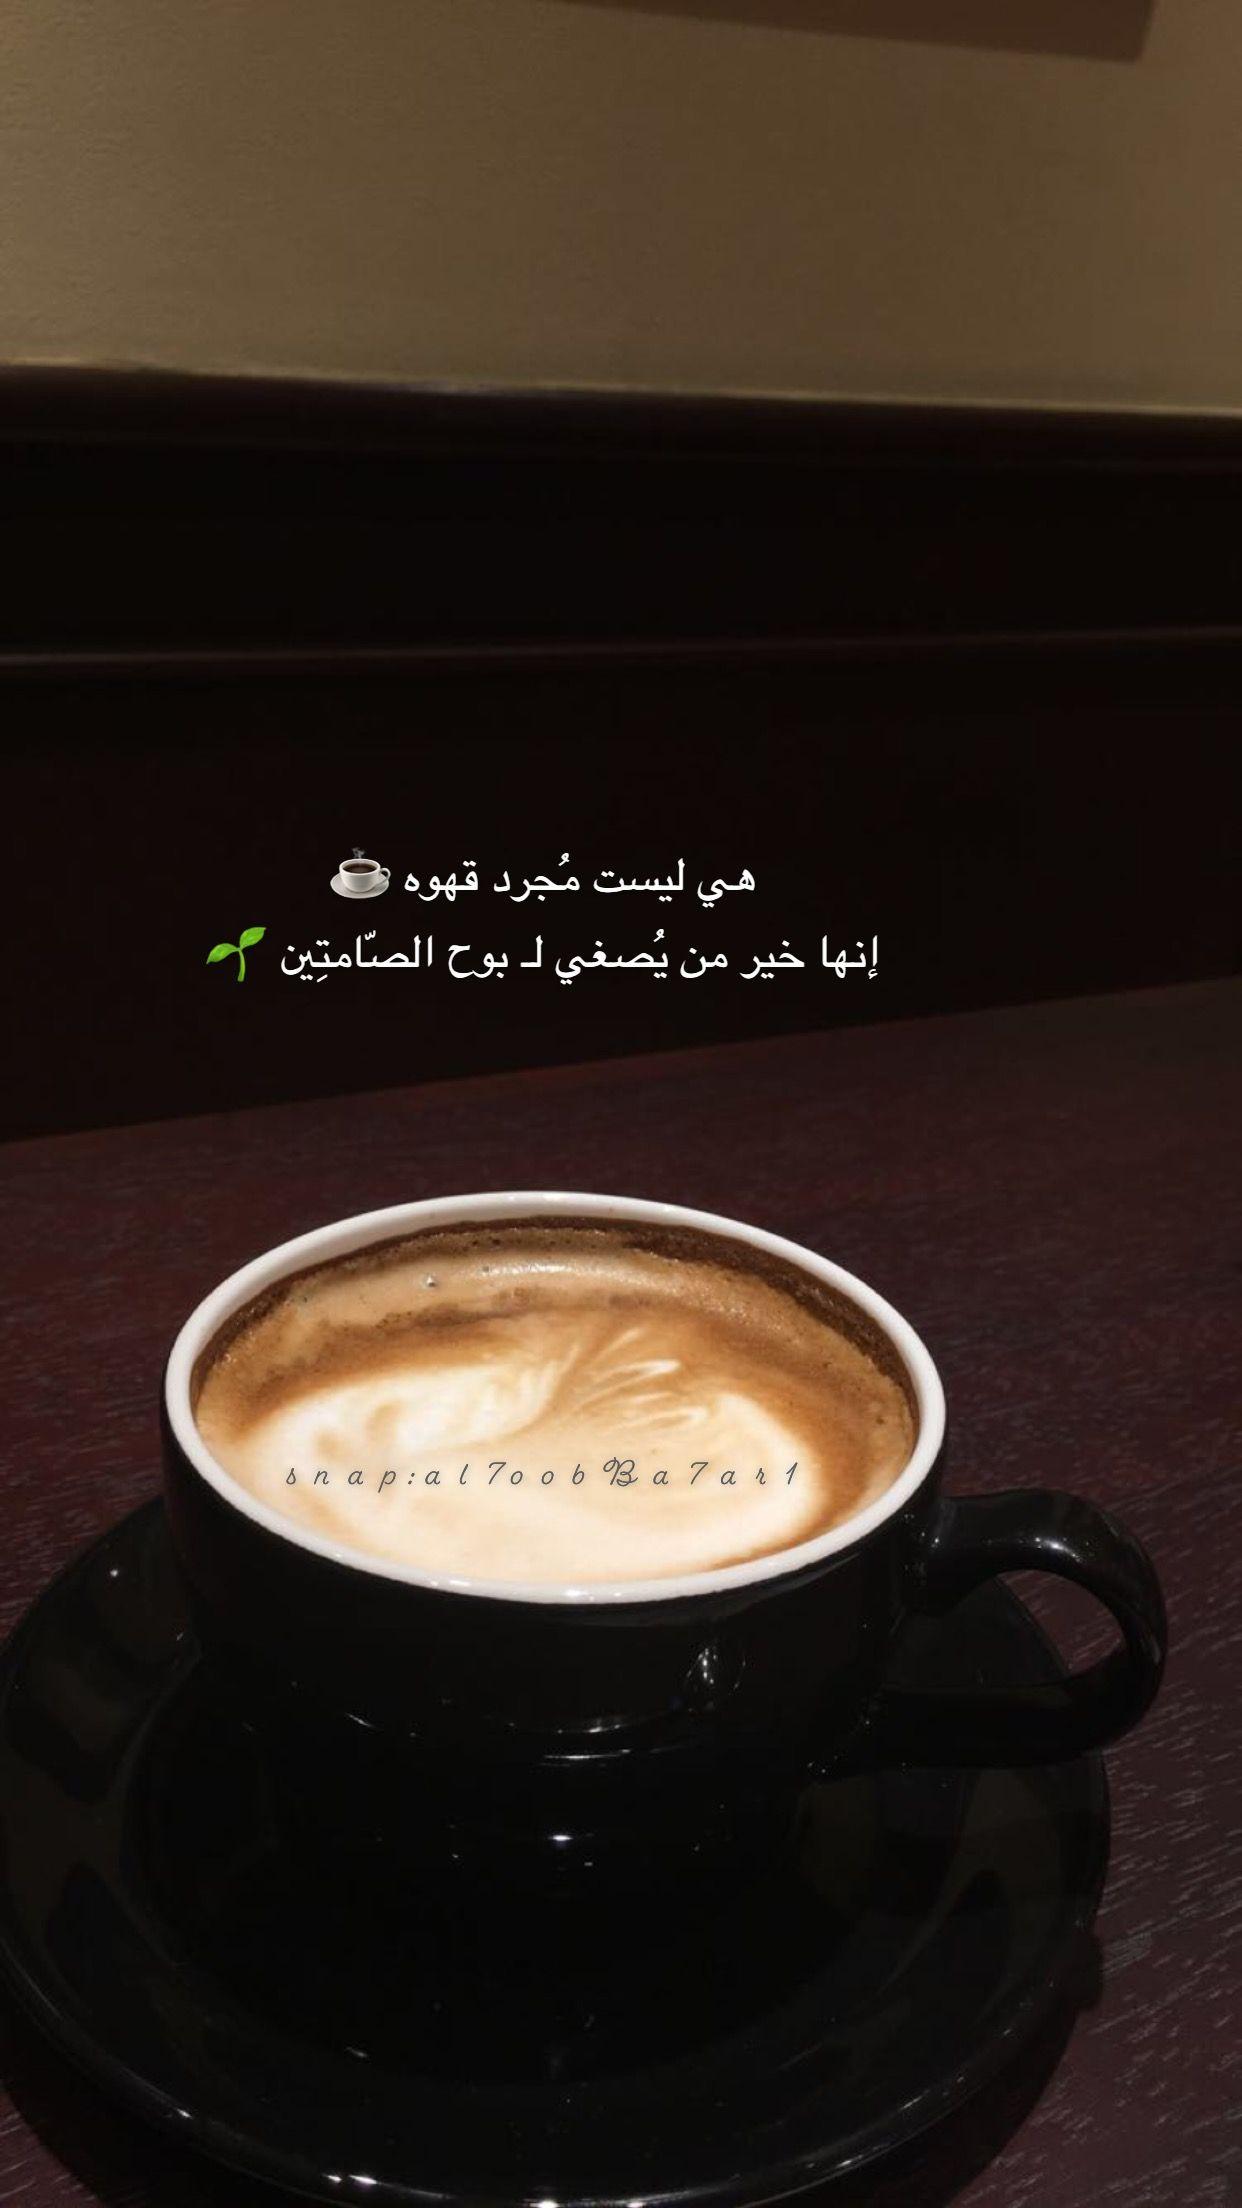 همسه هي ليست م جرد قهوه إنها خير من ي صغي لـ بوح